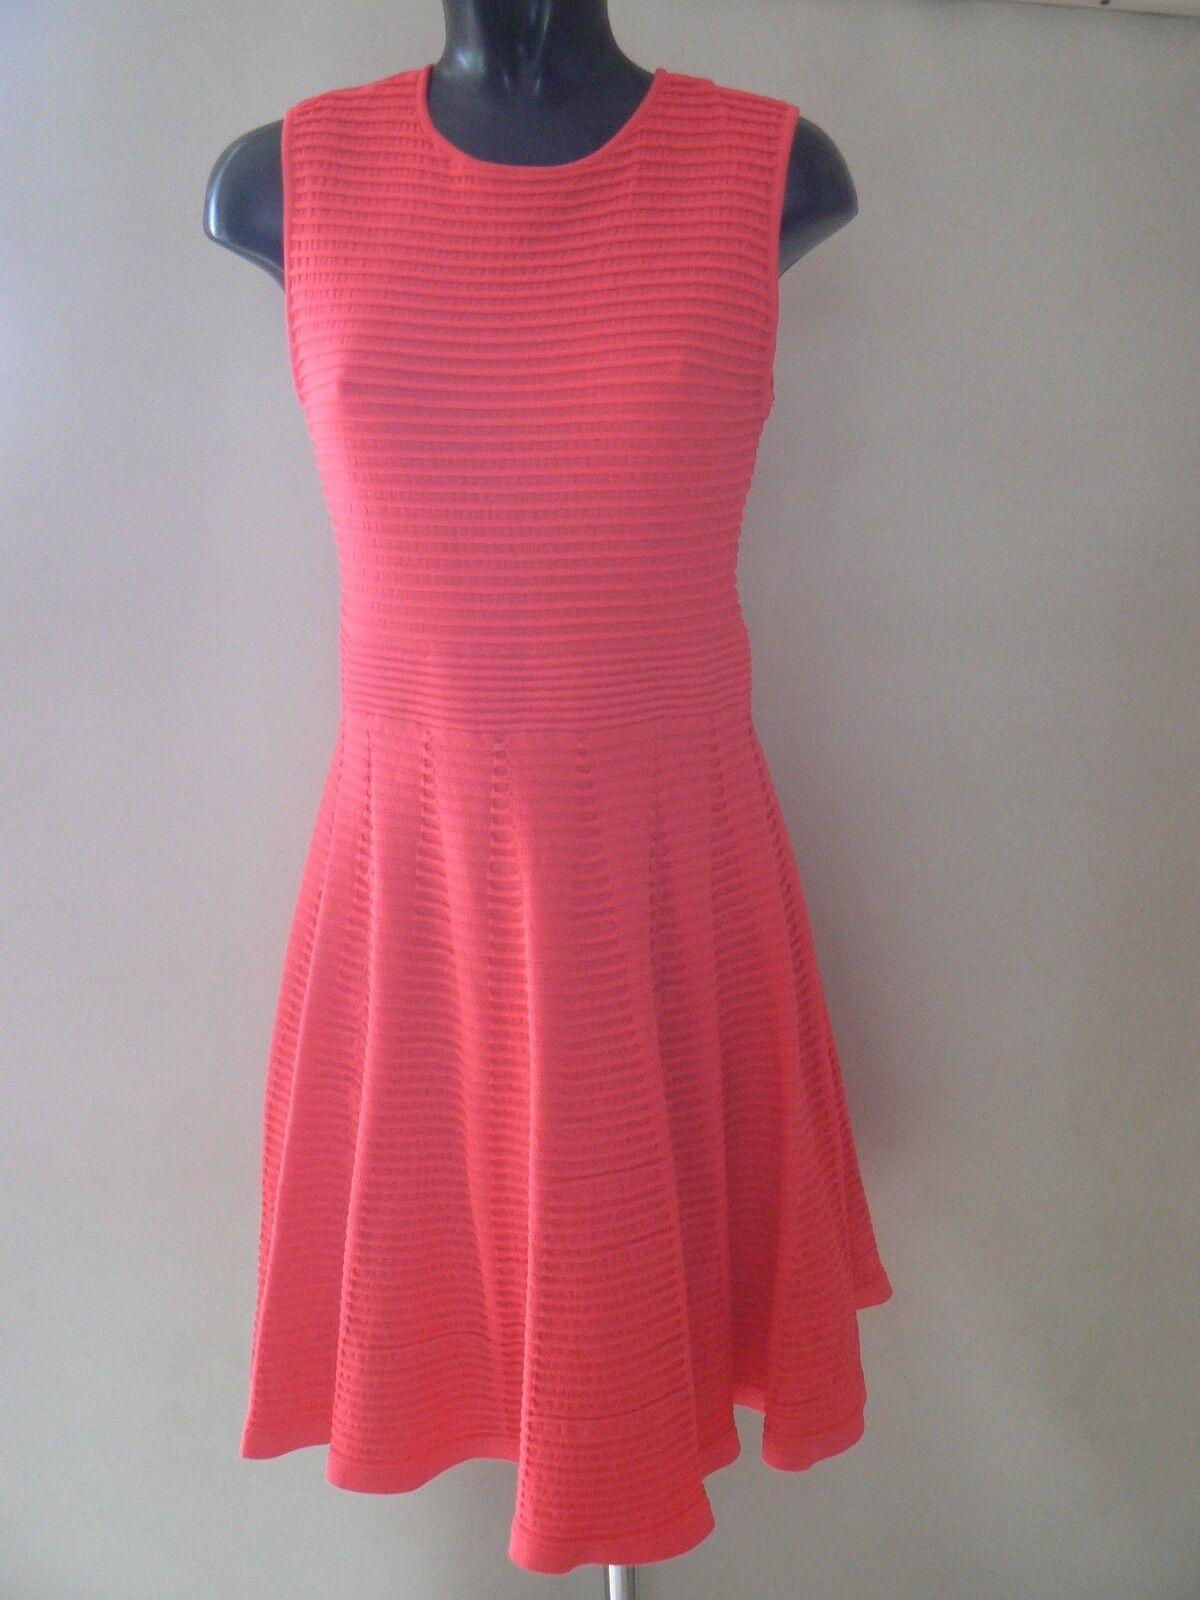 TED BAKER Malou Ottaman Detailed Dress Größe 1 - 8 Größe 4 - 14 NEW TAGS